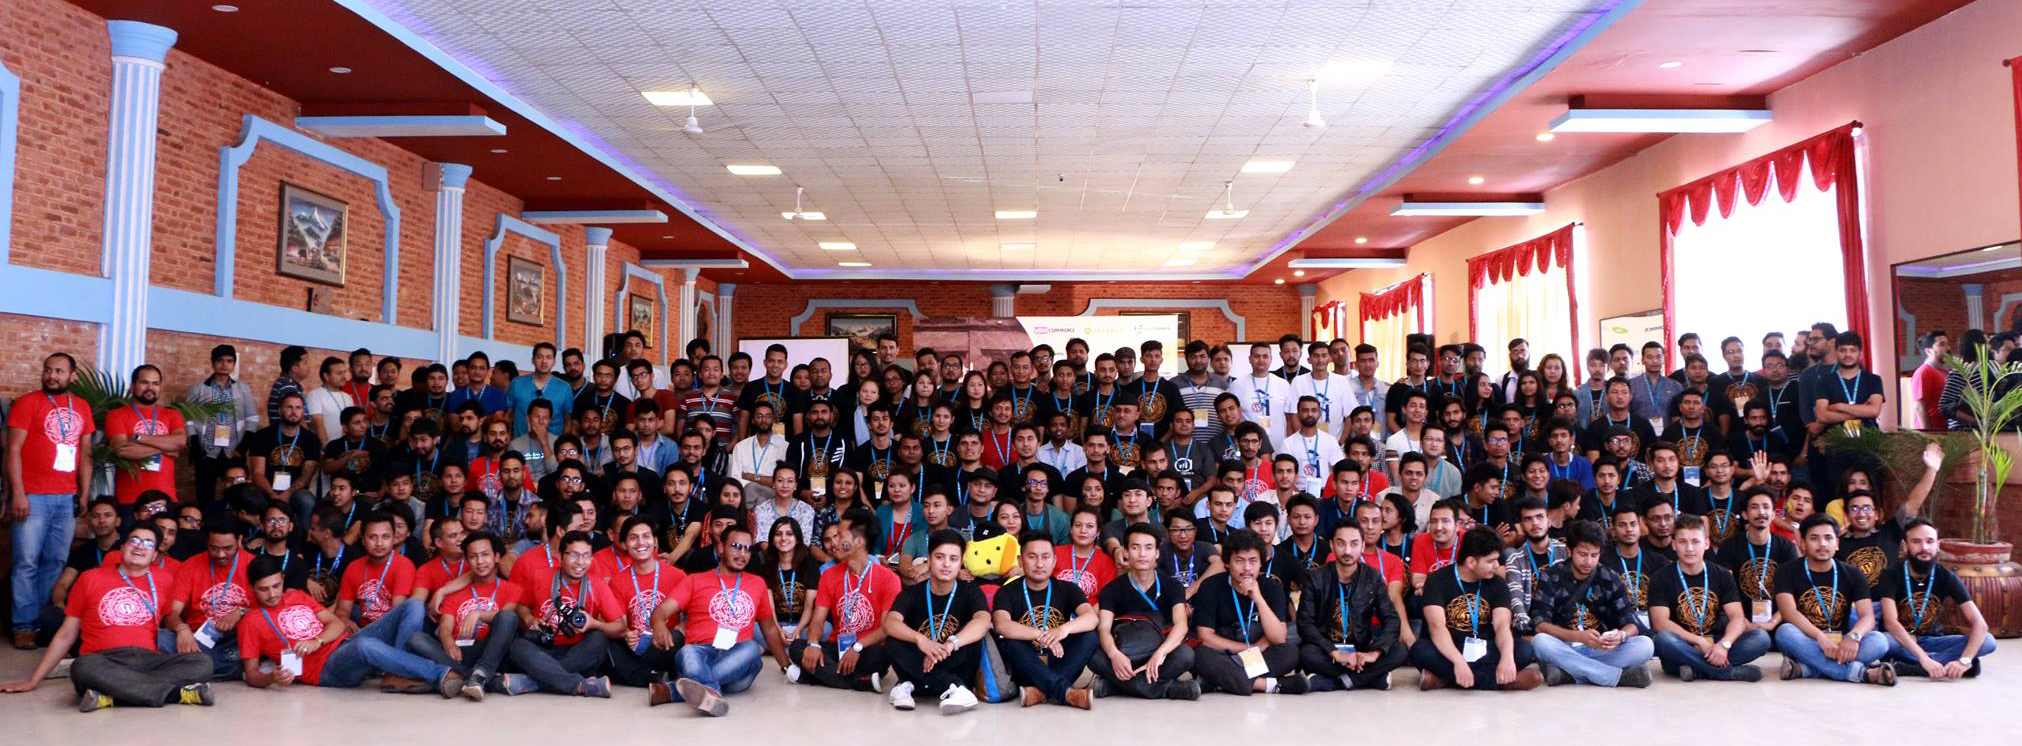 WordCamp Kathmandu 2017 Attendees